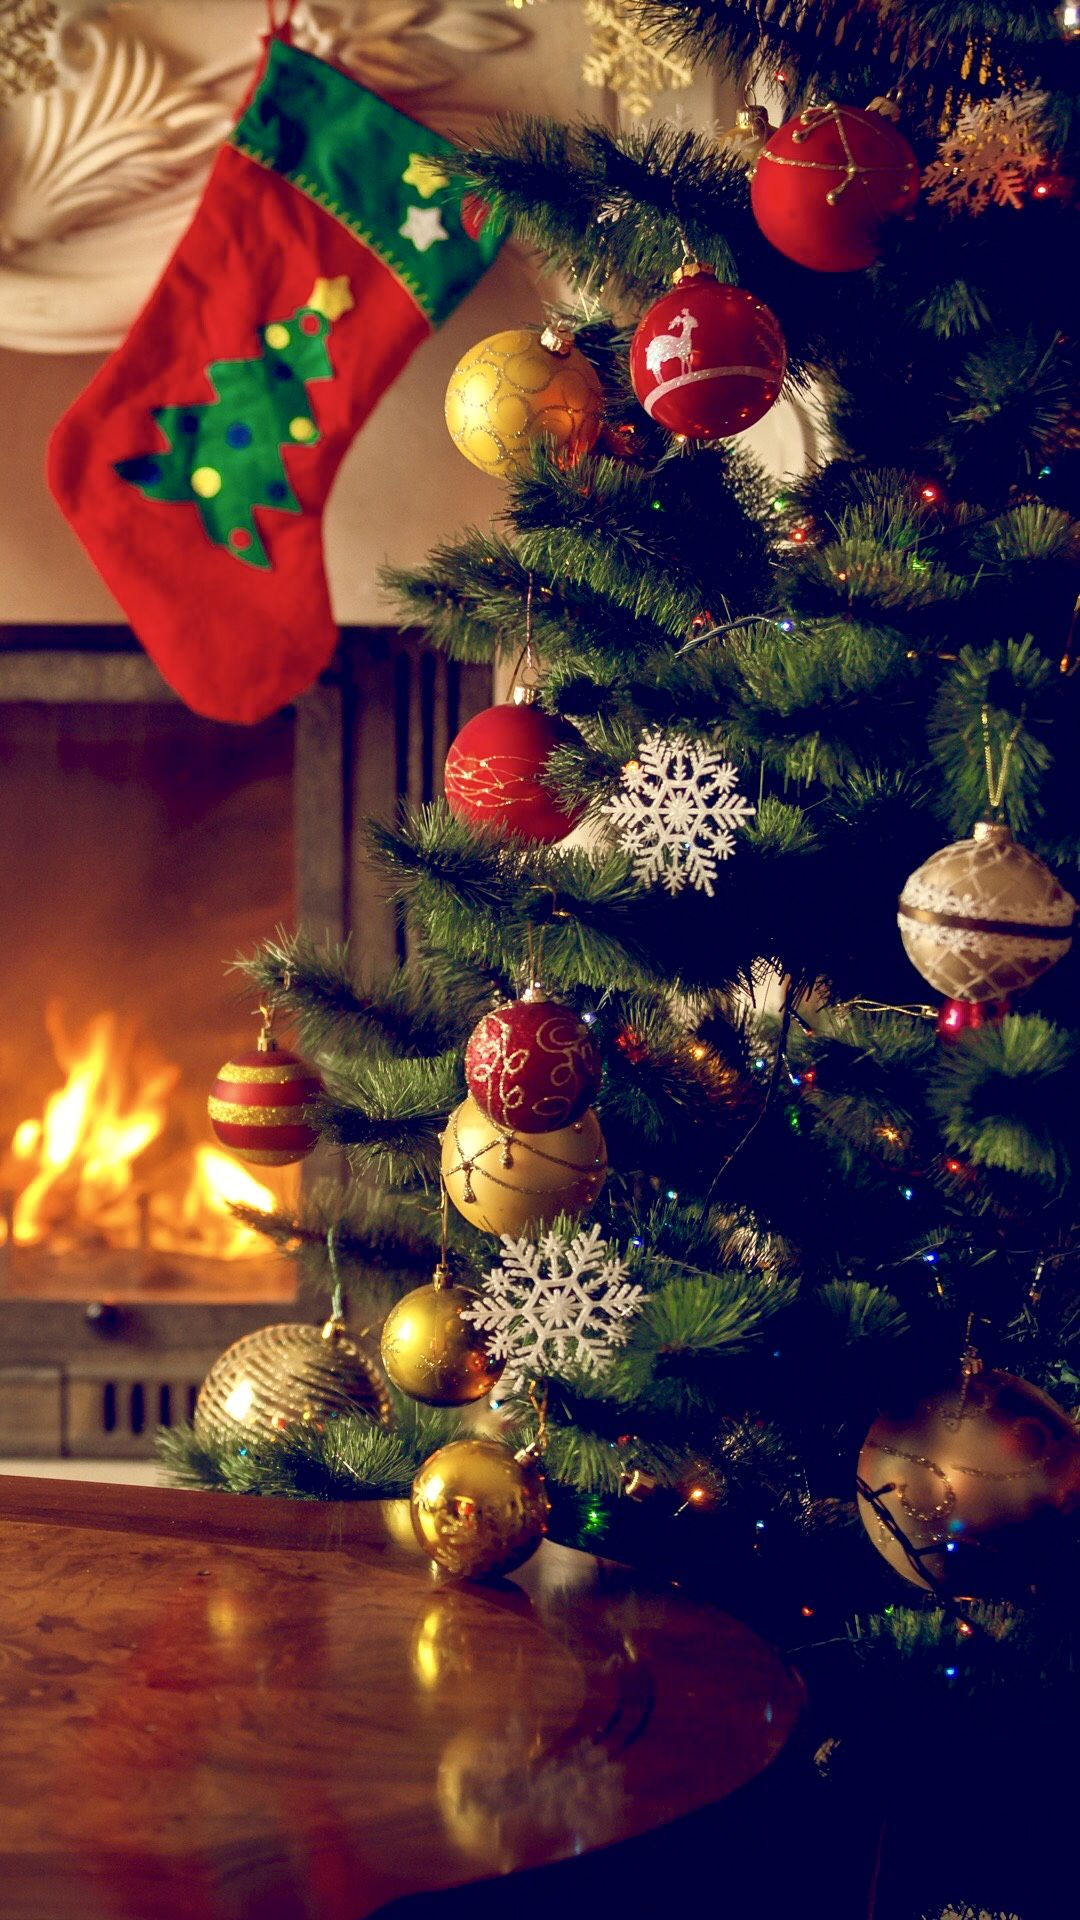 Christmas iPhone wallpaper Рождественские обои